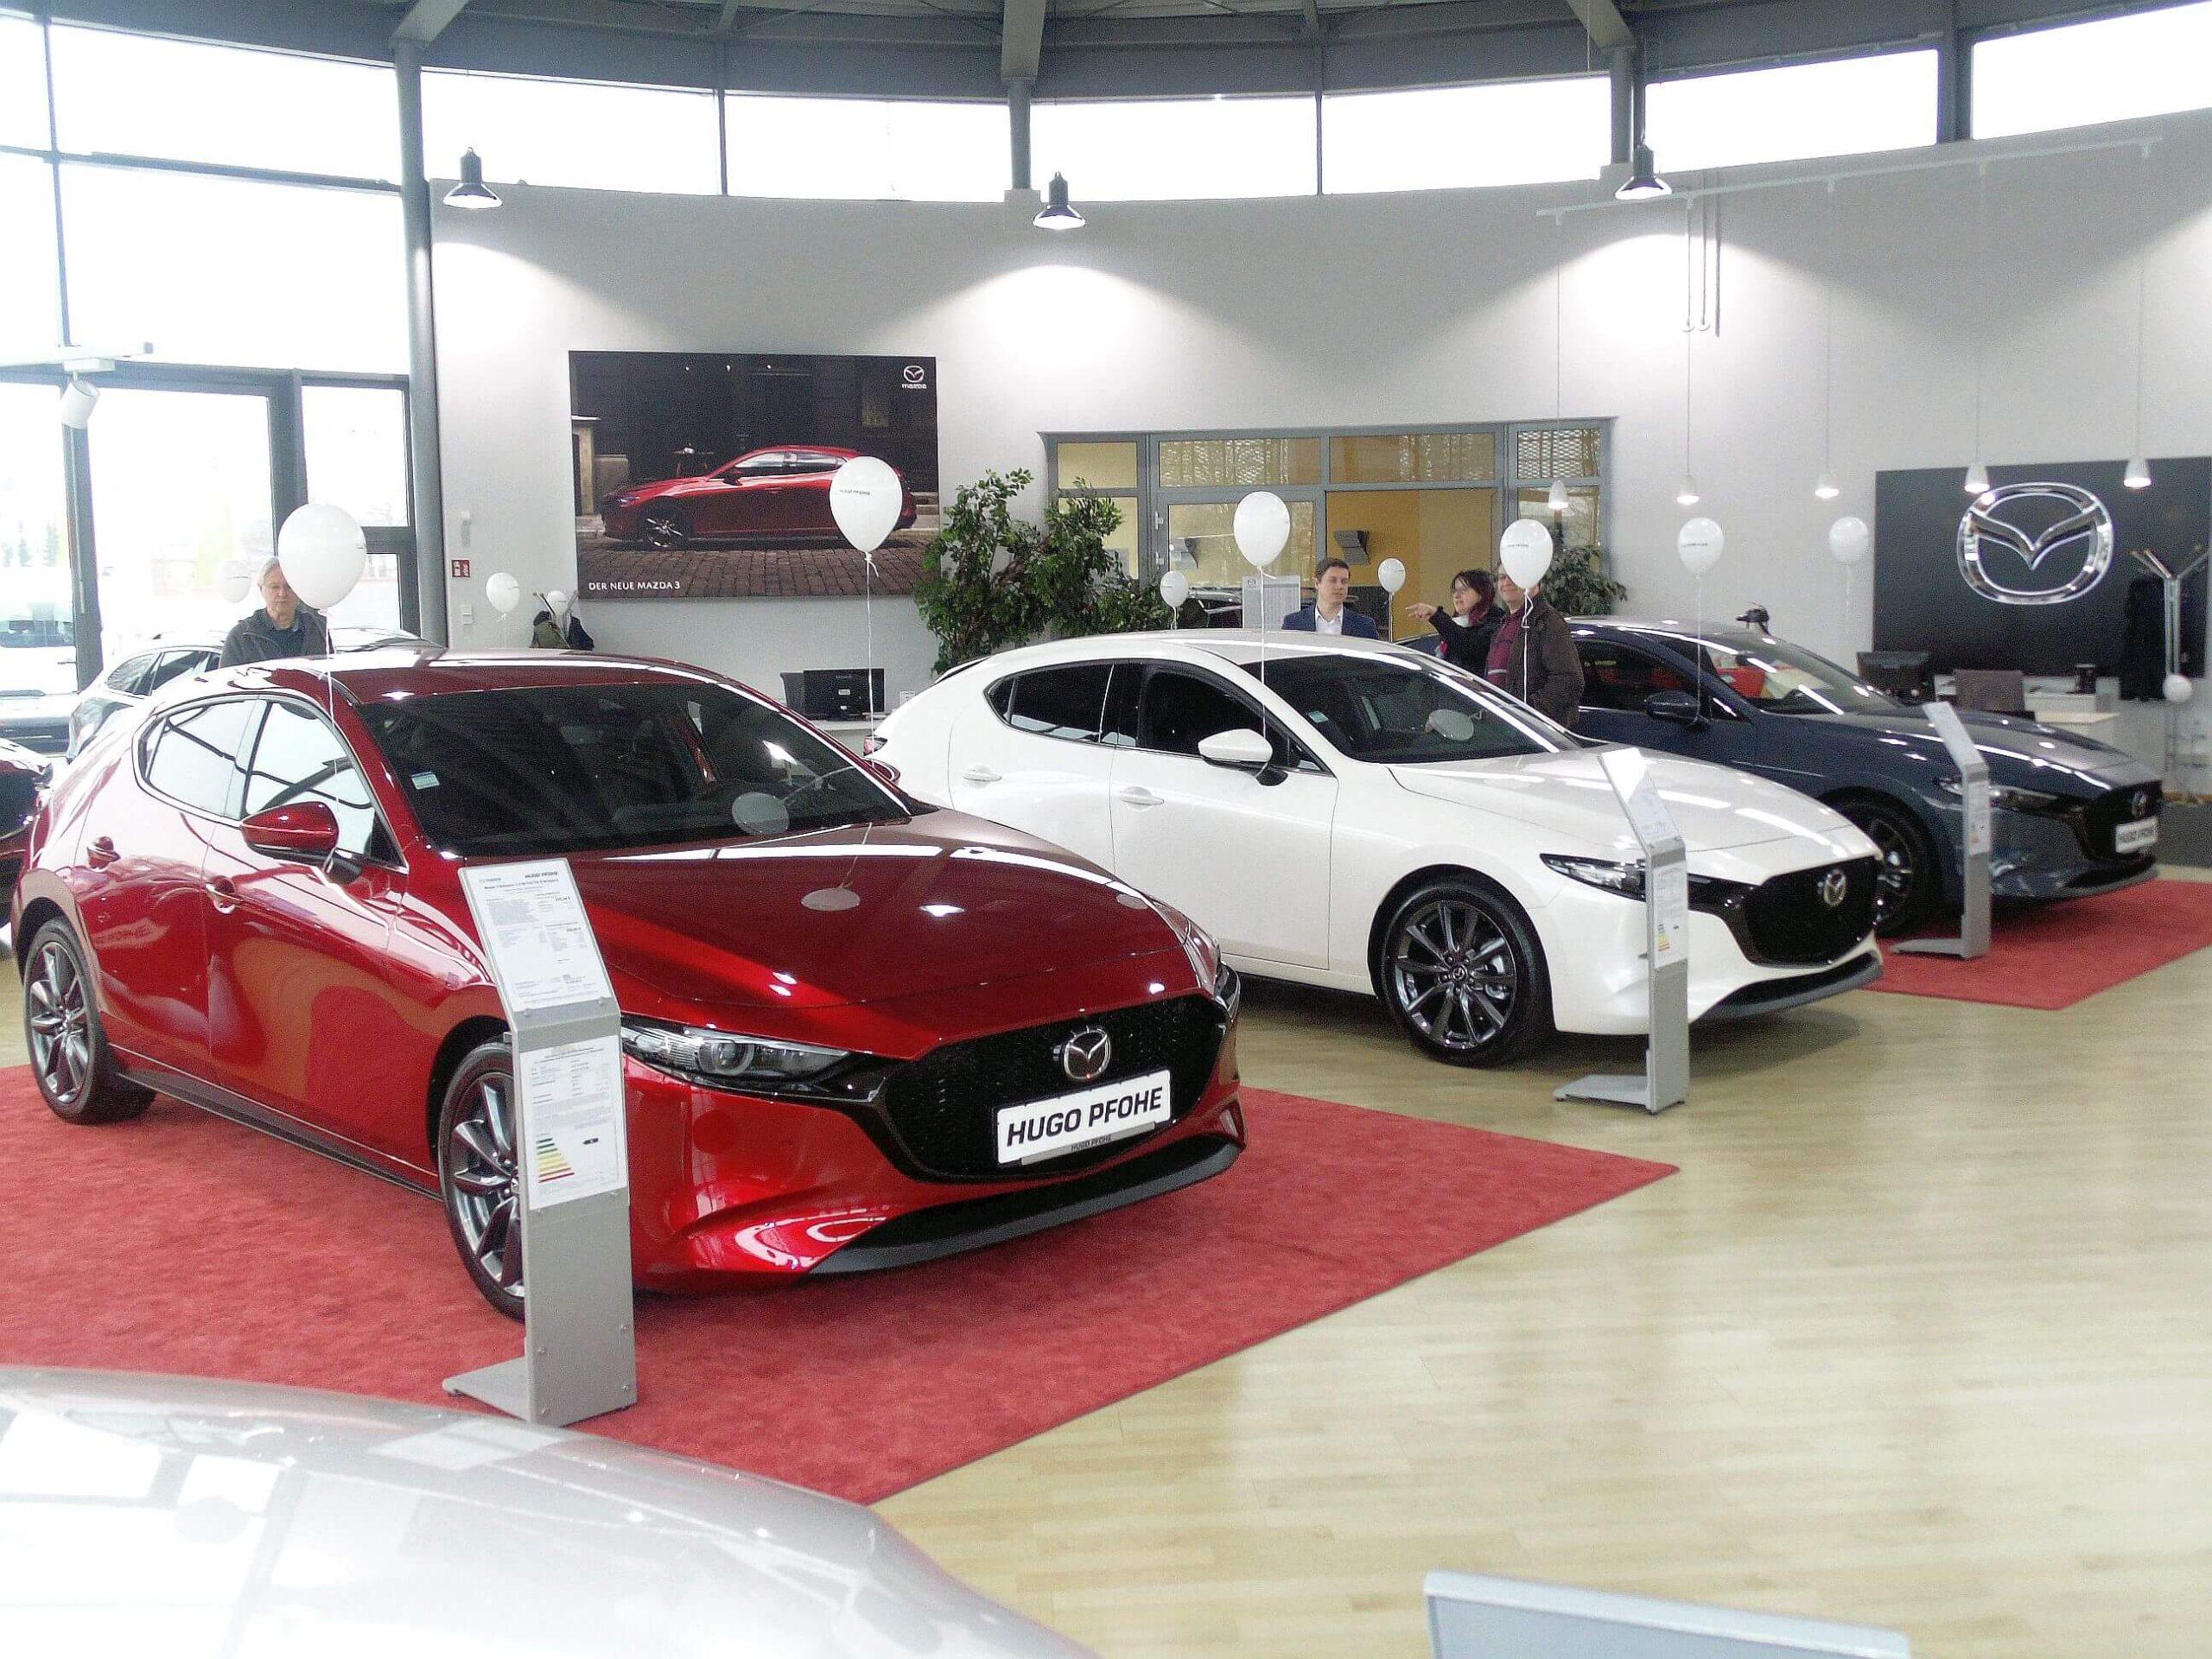 Premiere des Mazda 3 - Rückblick